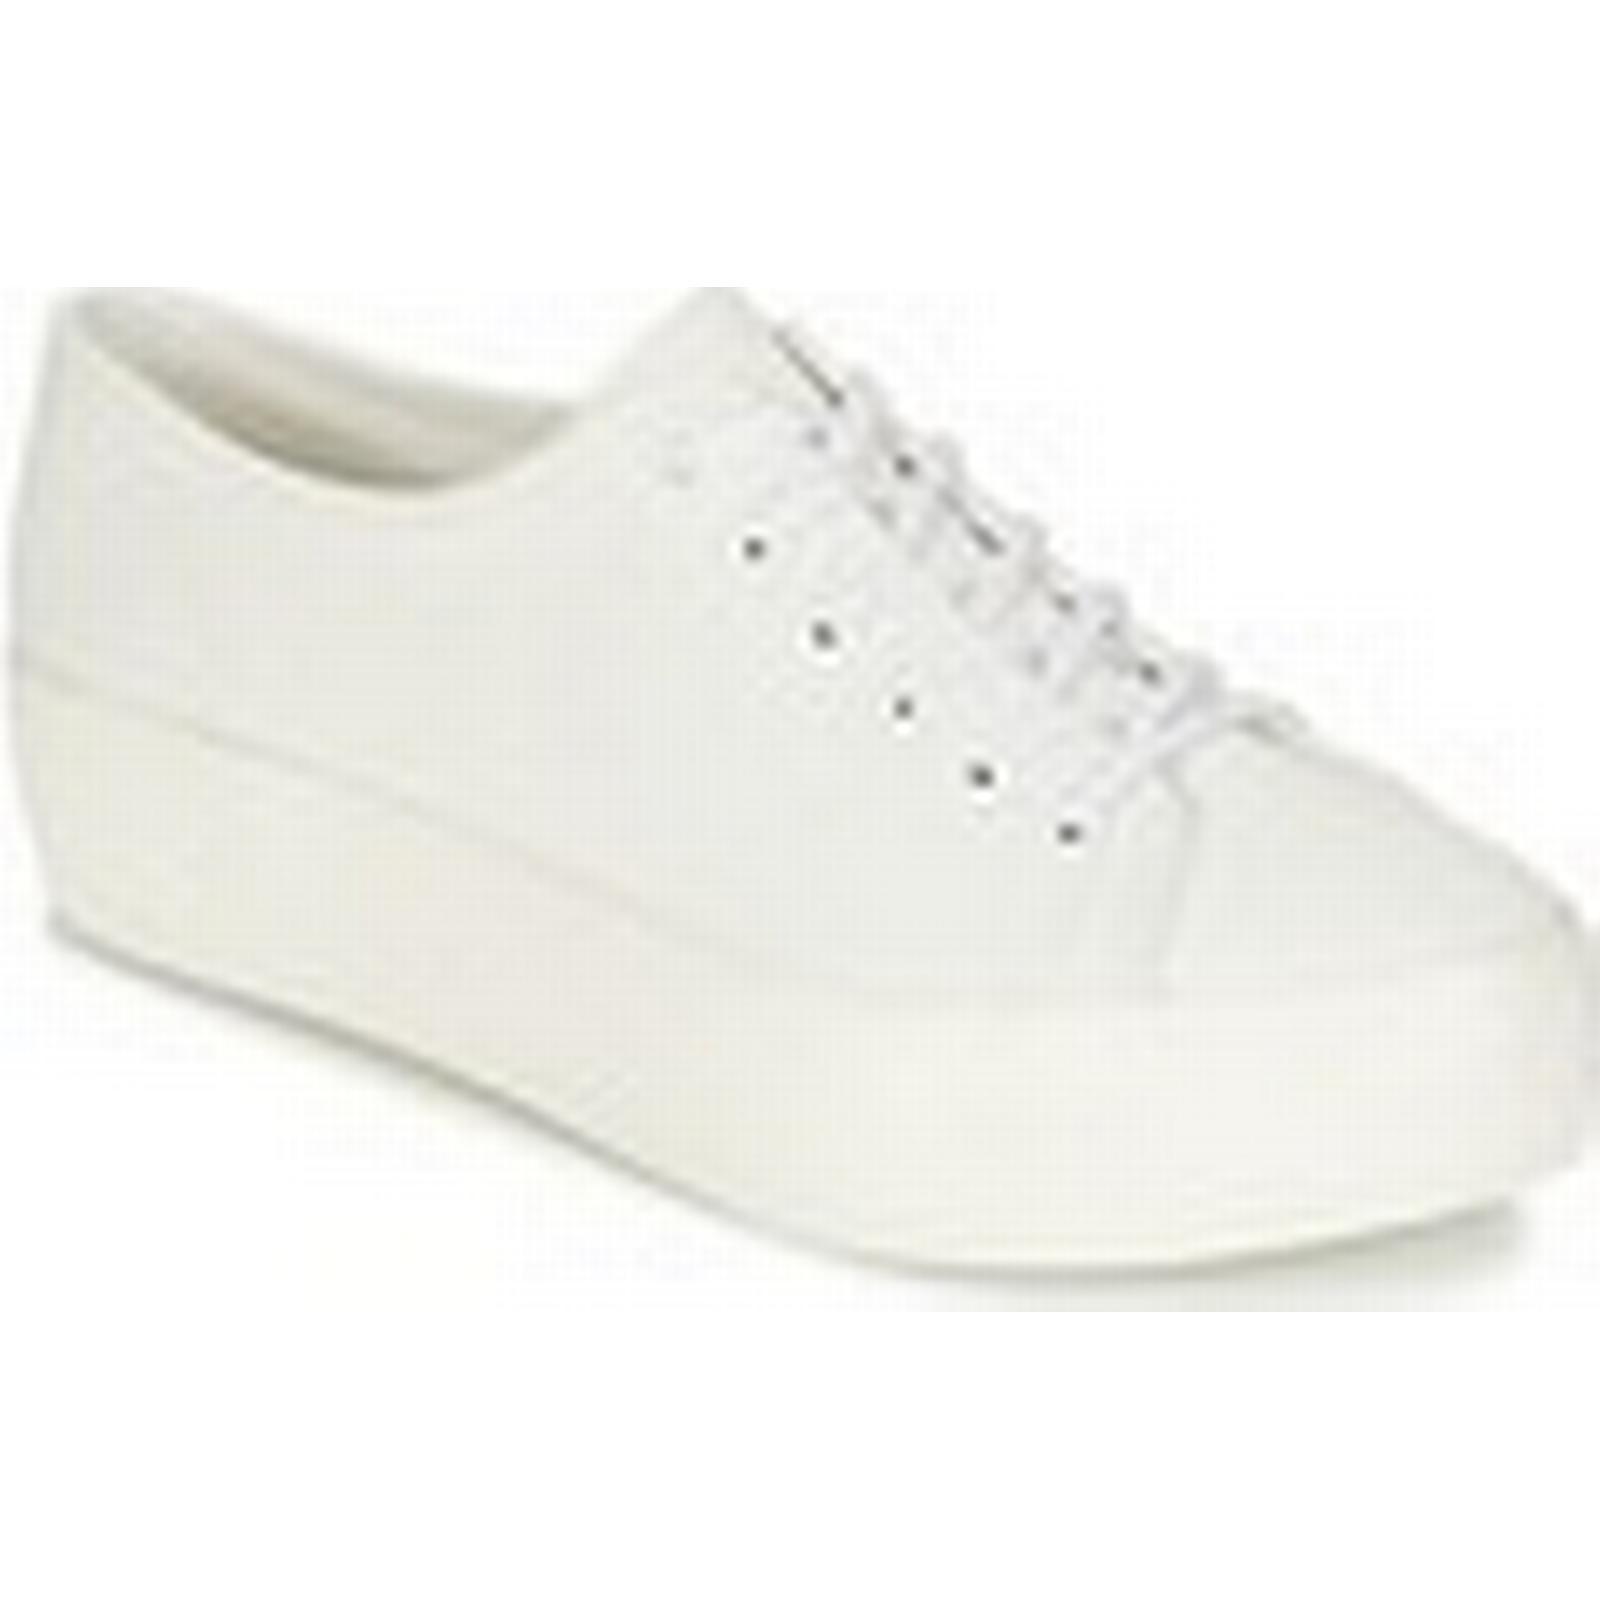 vagabond keira femmes & #  27; s Chaussure Chaussure Chaussure s (formateurs) en blanc fb7bf6